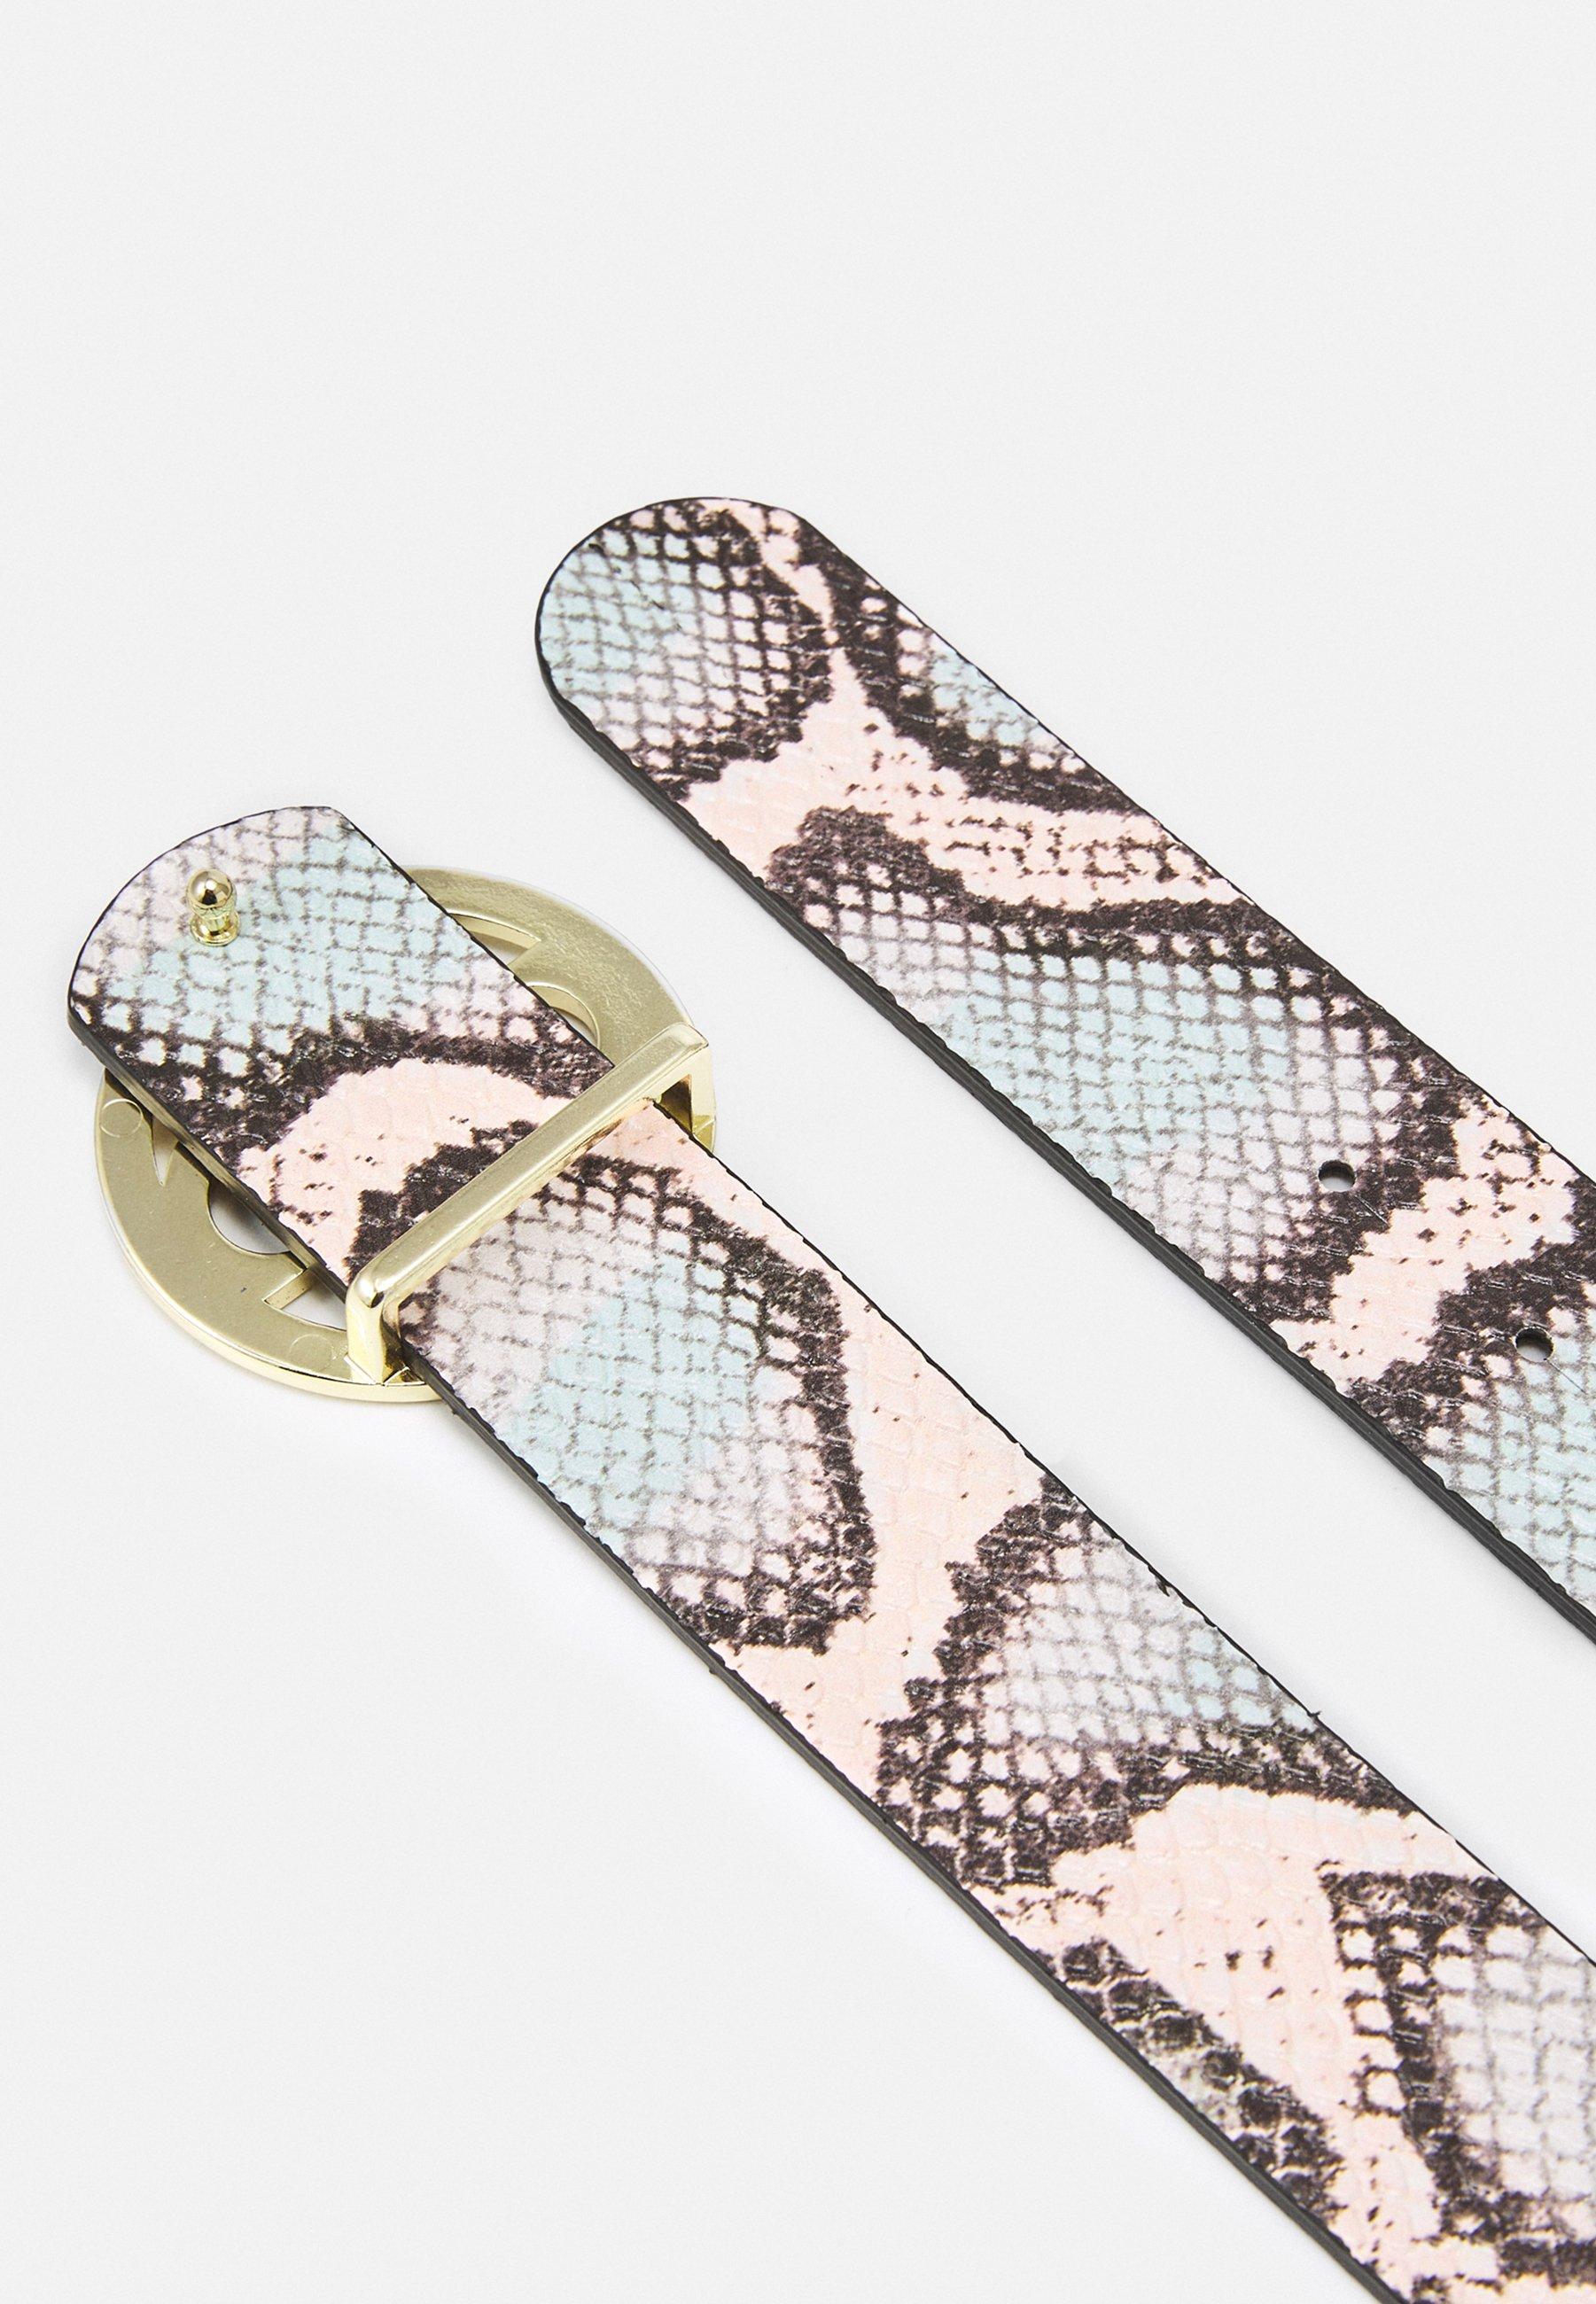 Women ALBURY NOT ADJUST PANT BELT - Belt